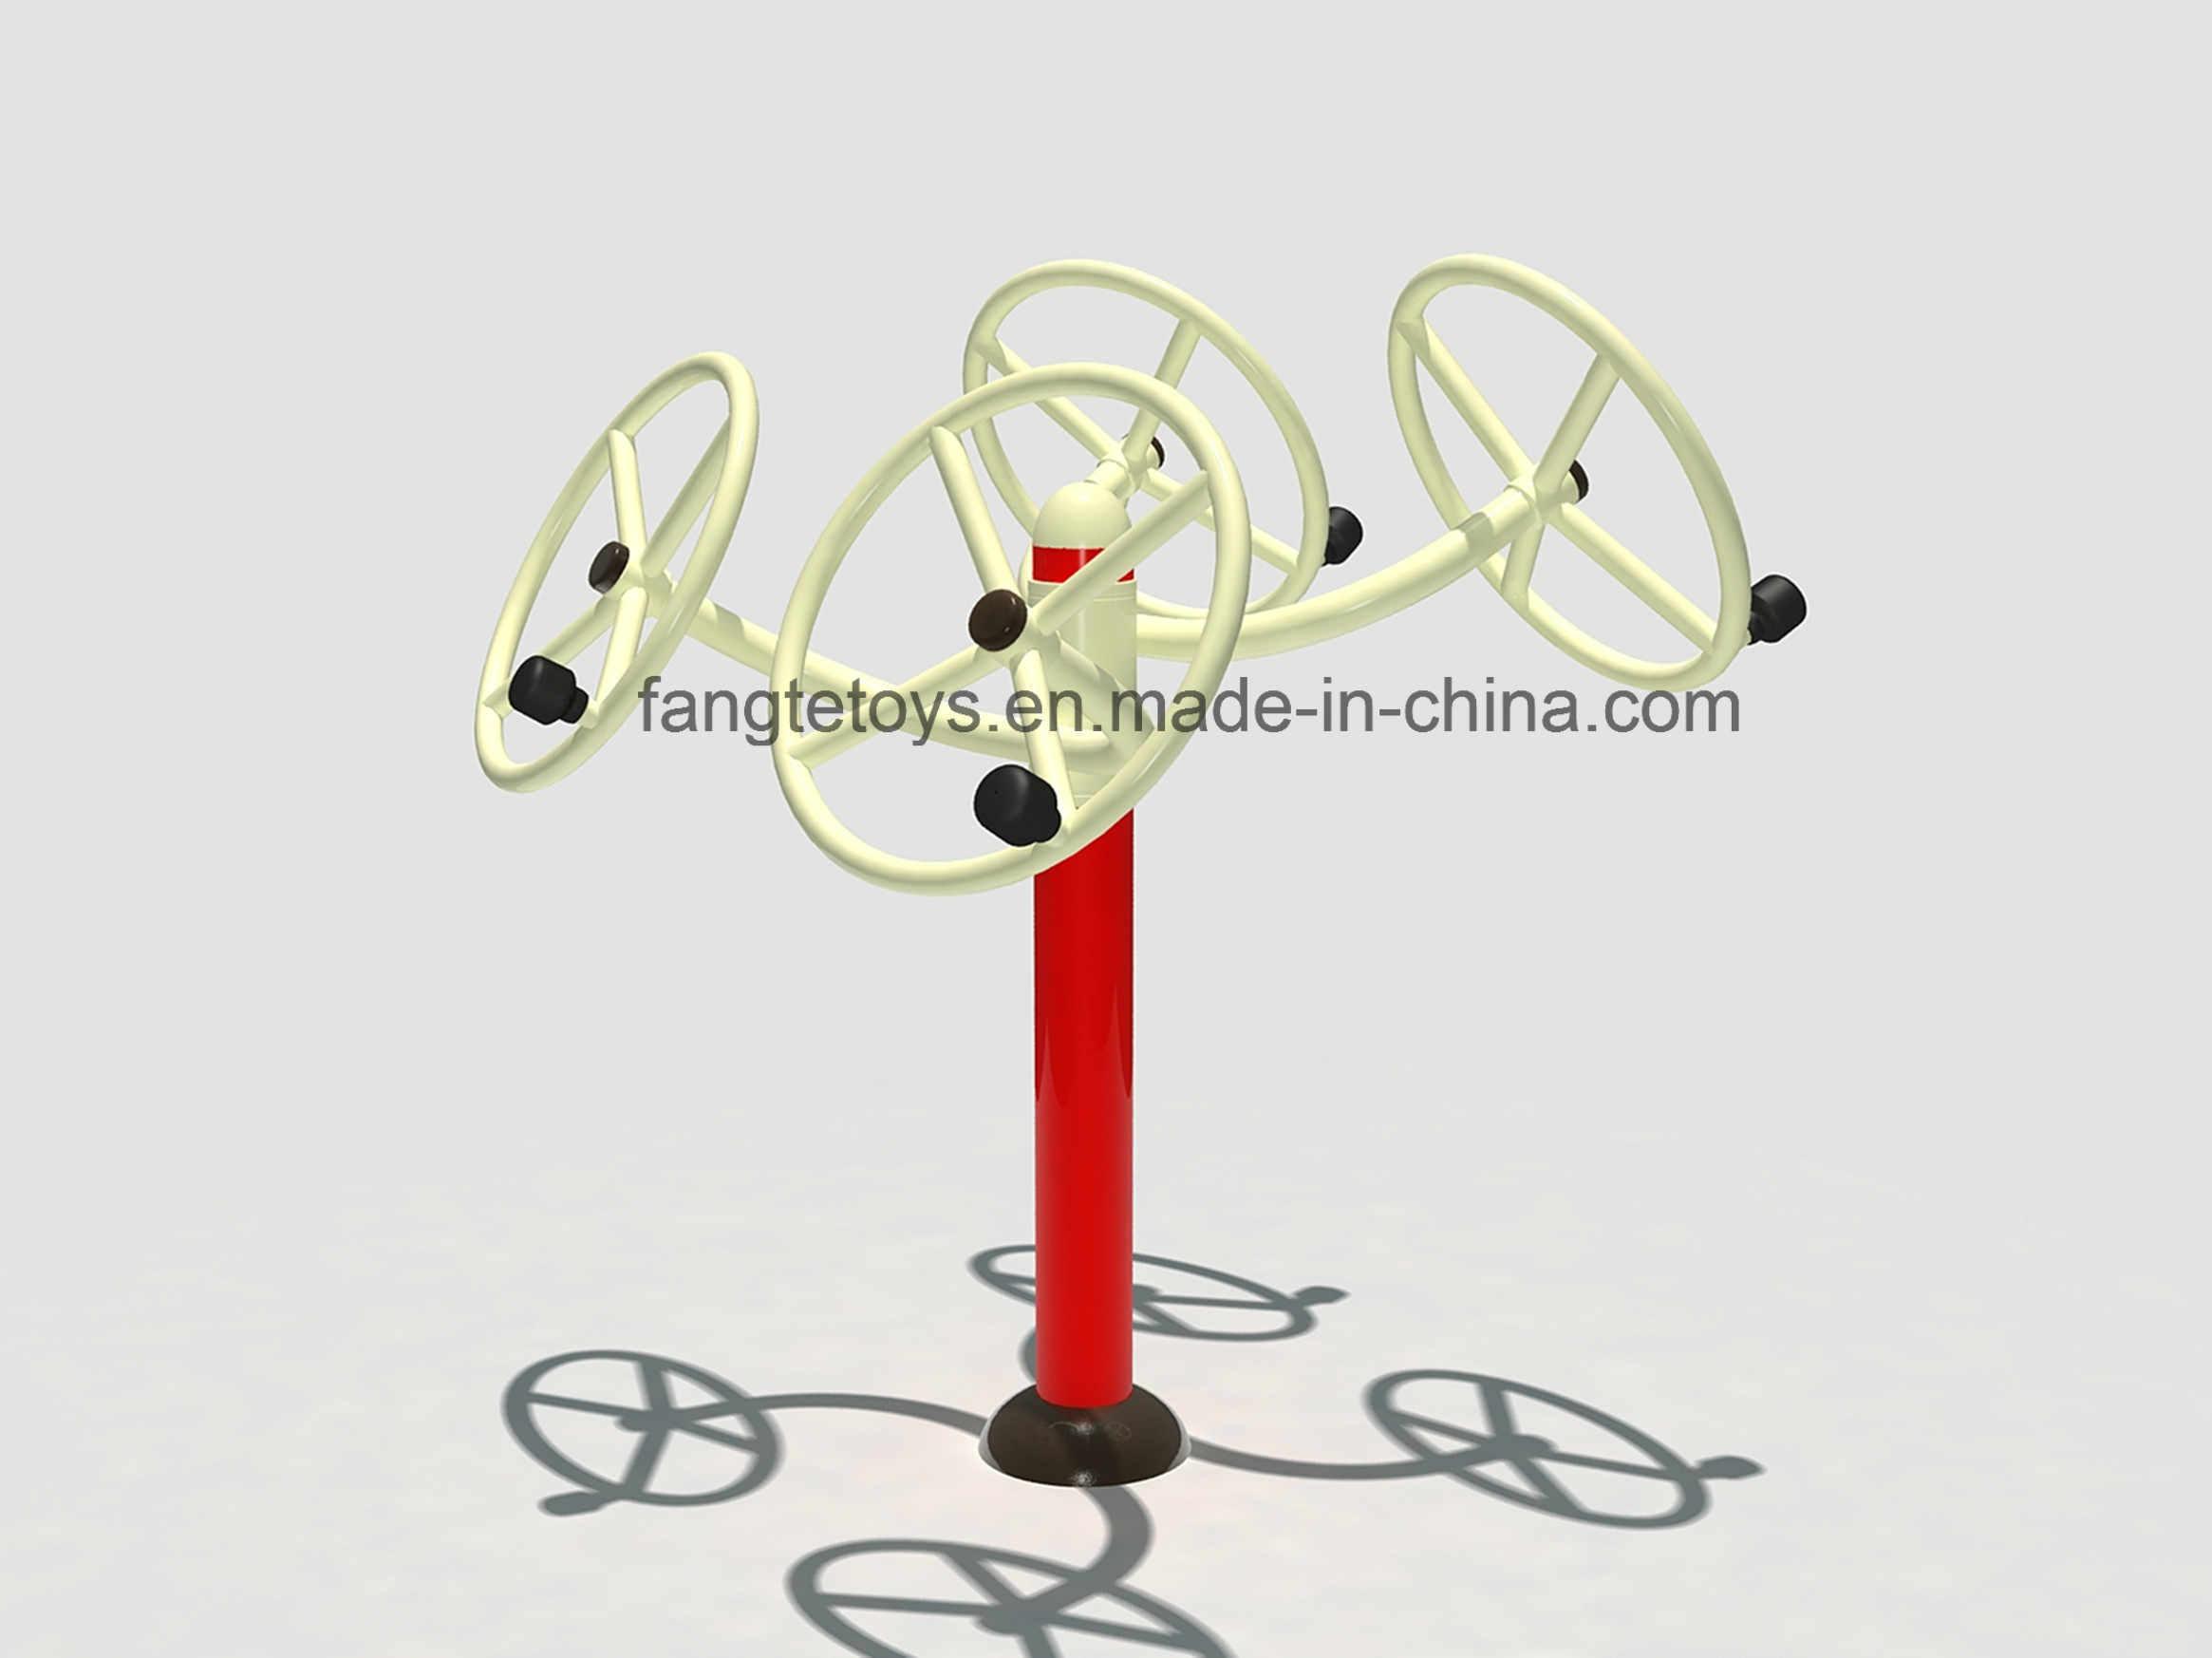 Outdoor Fitness Equipment Outdoor Exercise Equipment Taiji Wheel FT-Of326